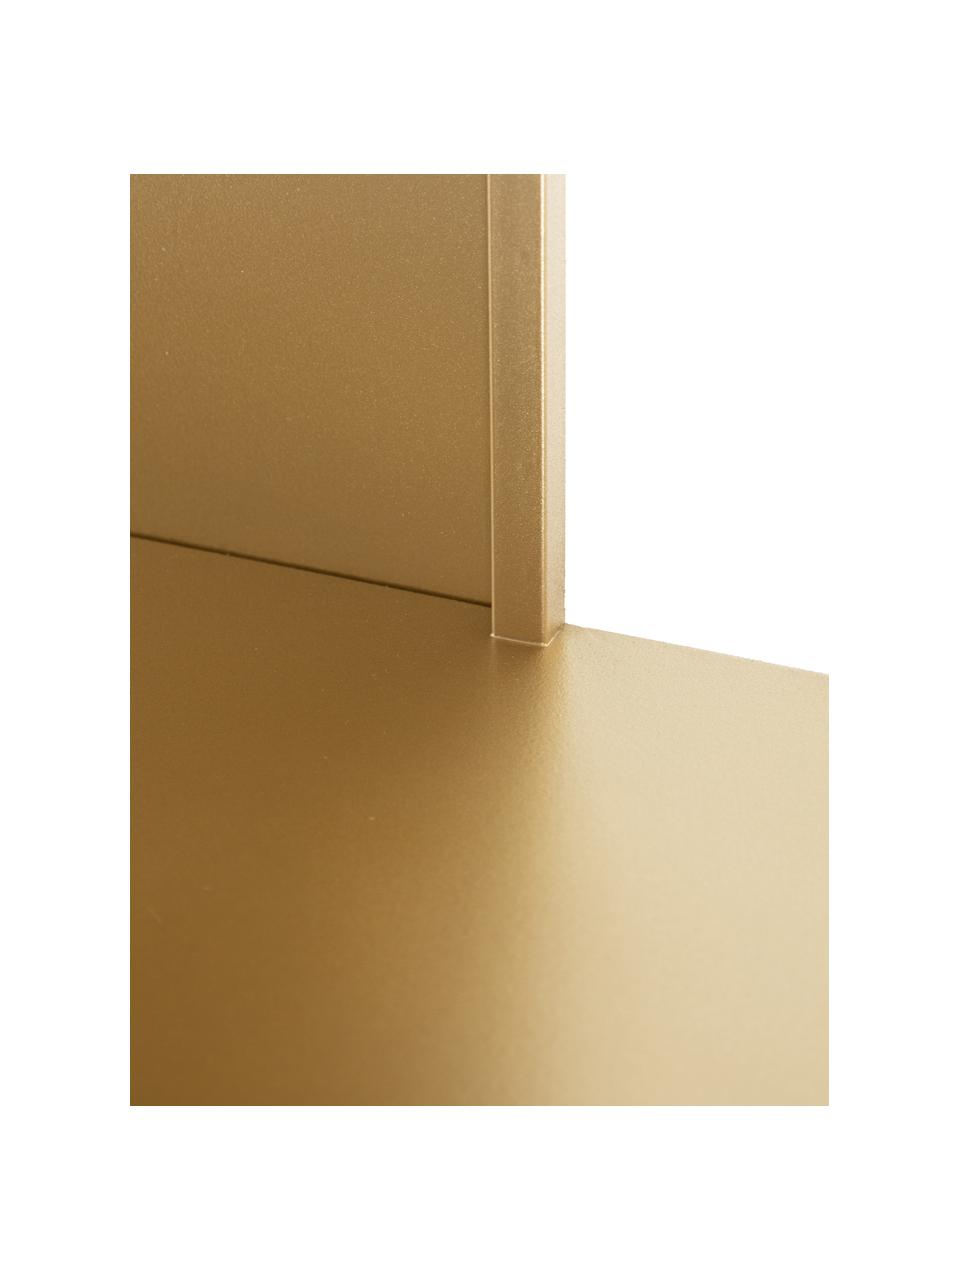 Metalen wandrek Talme in goudkleurig, Gecoat metaal, Goudkleurig, 100 x 175 cm